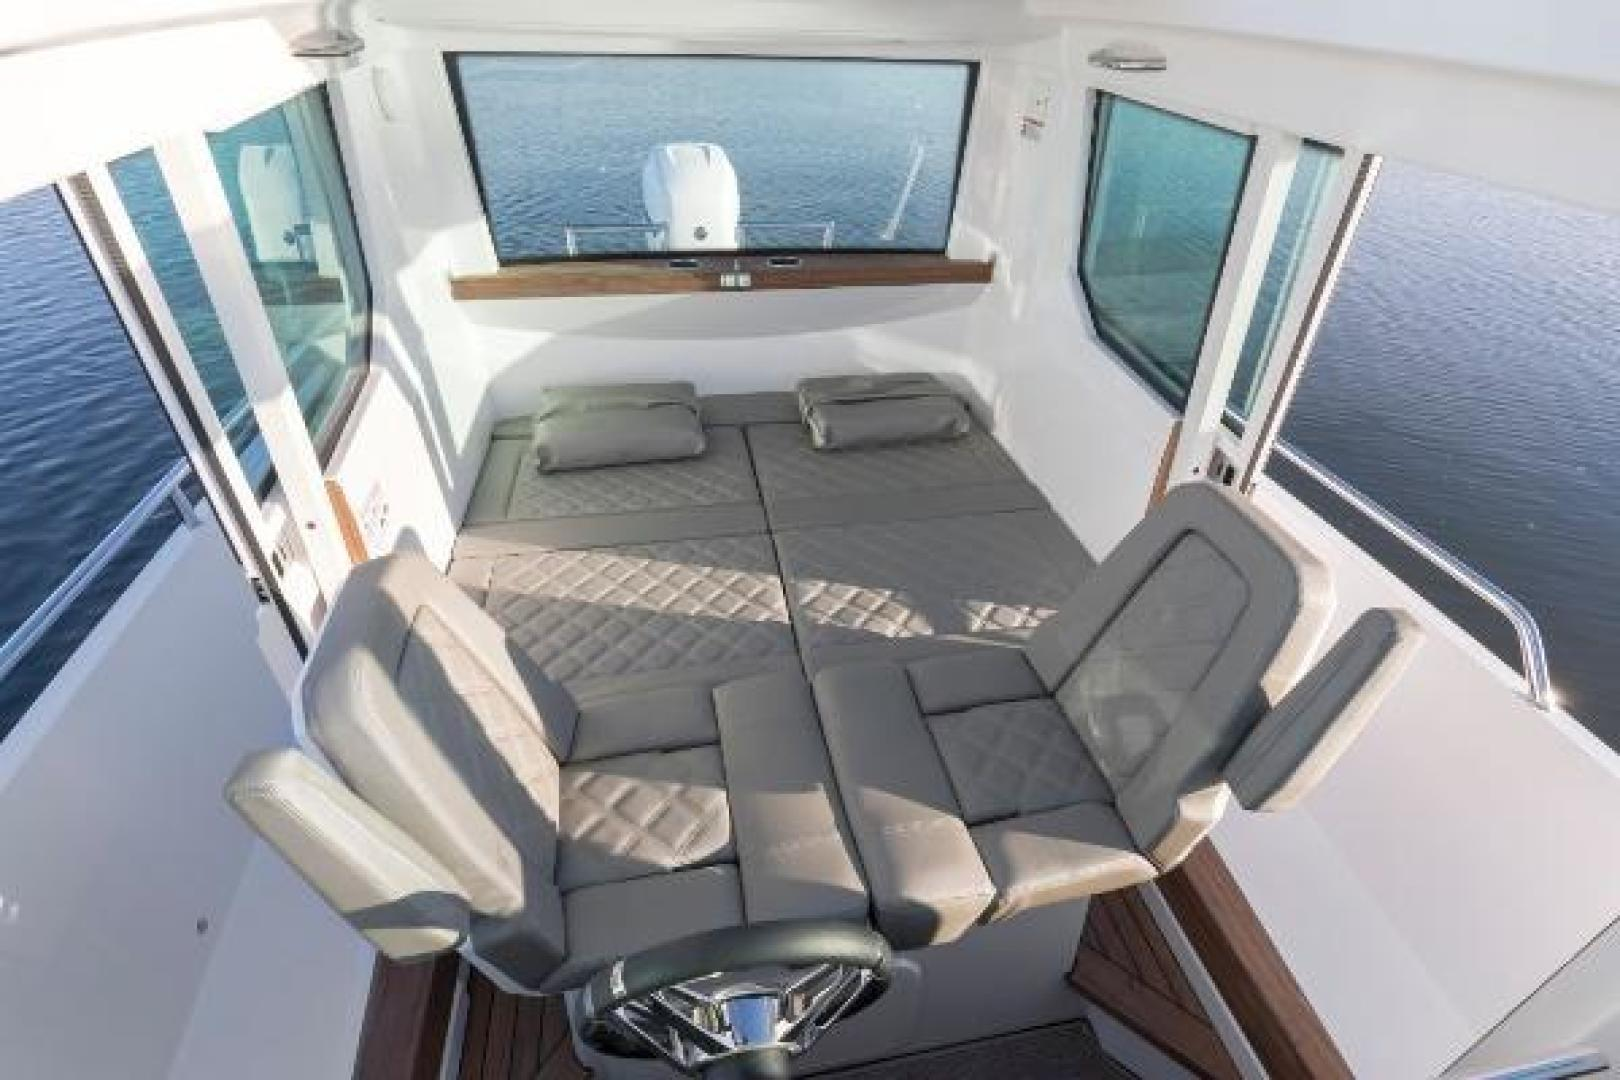 Axopar-28 CABIN 2020-Axopar 28 CABIN Fort Lauderdale-Florida-United States-1531324 | Thumbnail